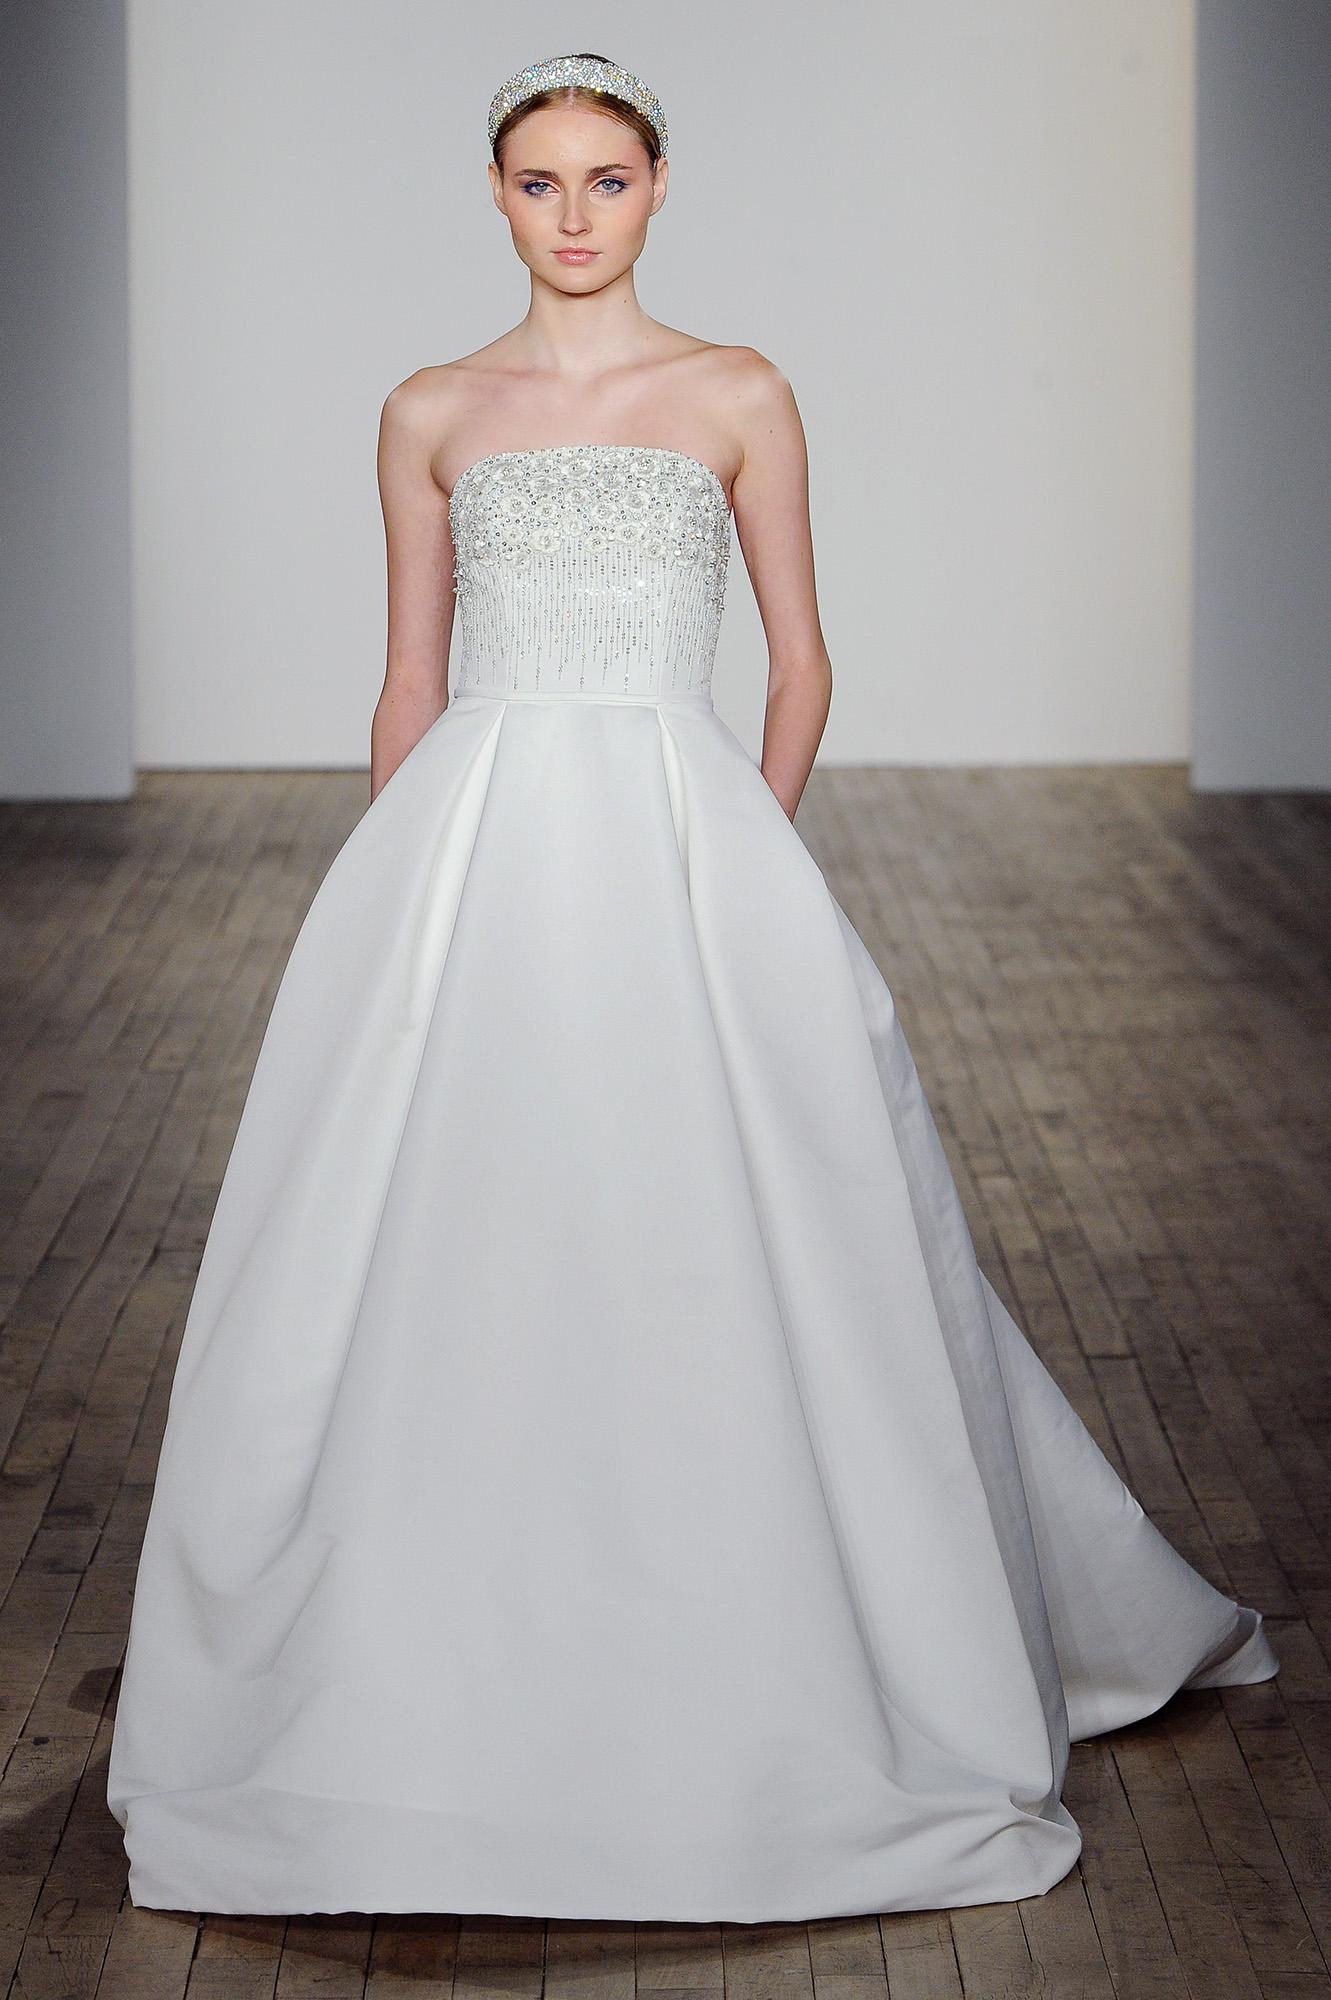 allison webb wedding dress embellished bodice strapless ball gown